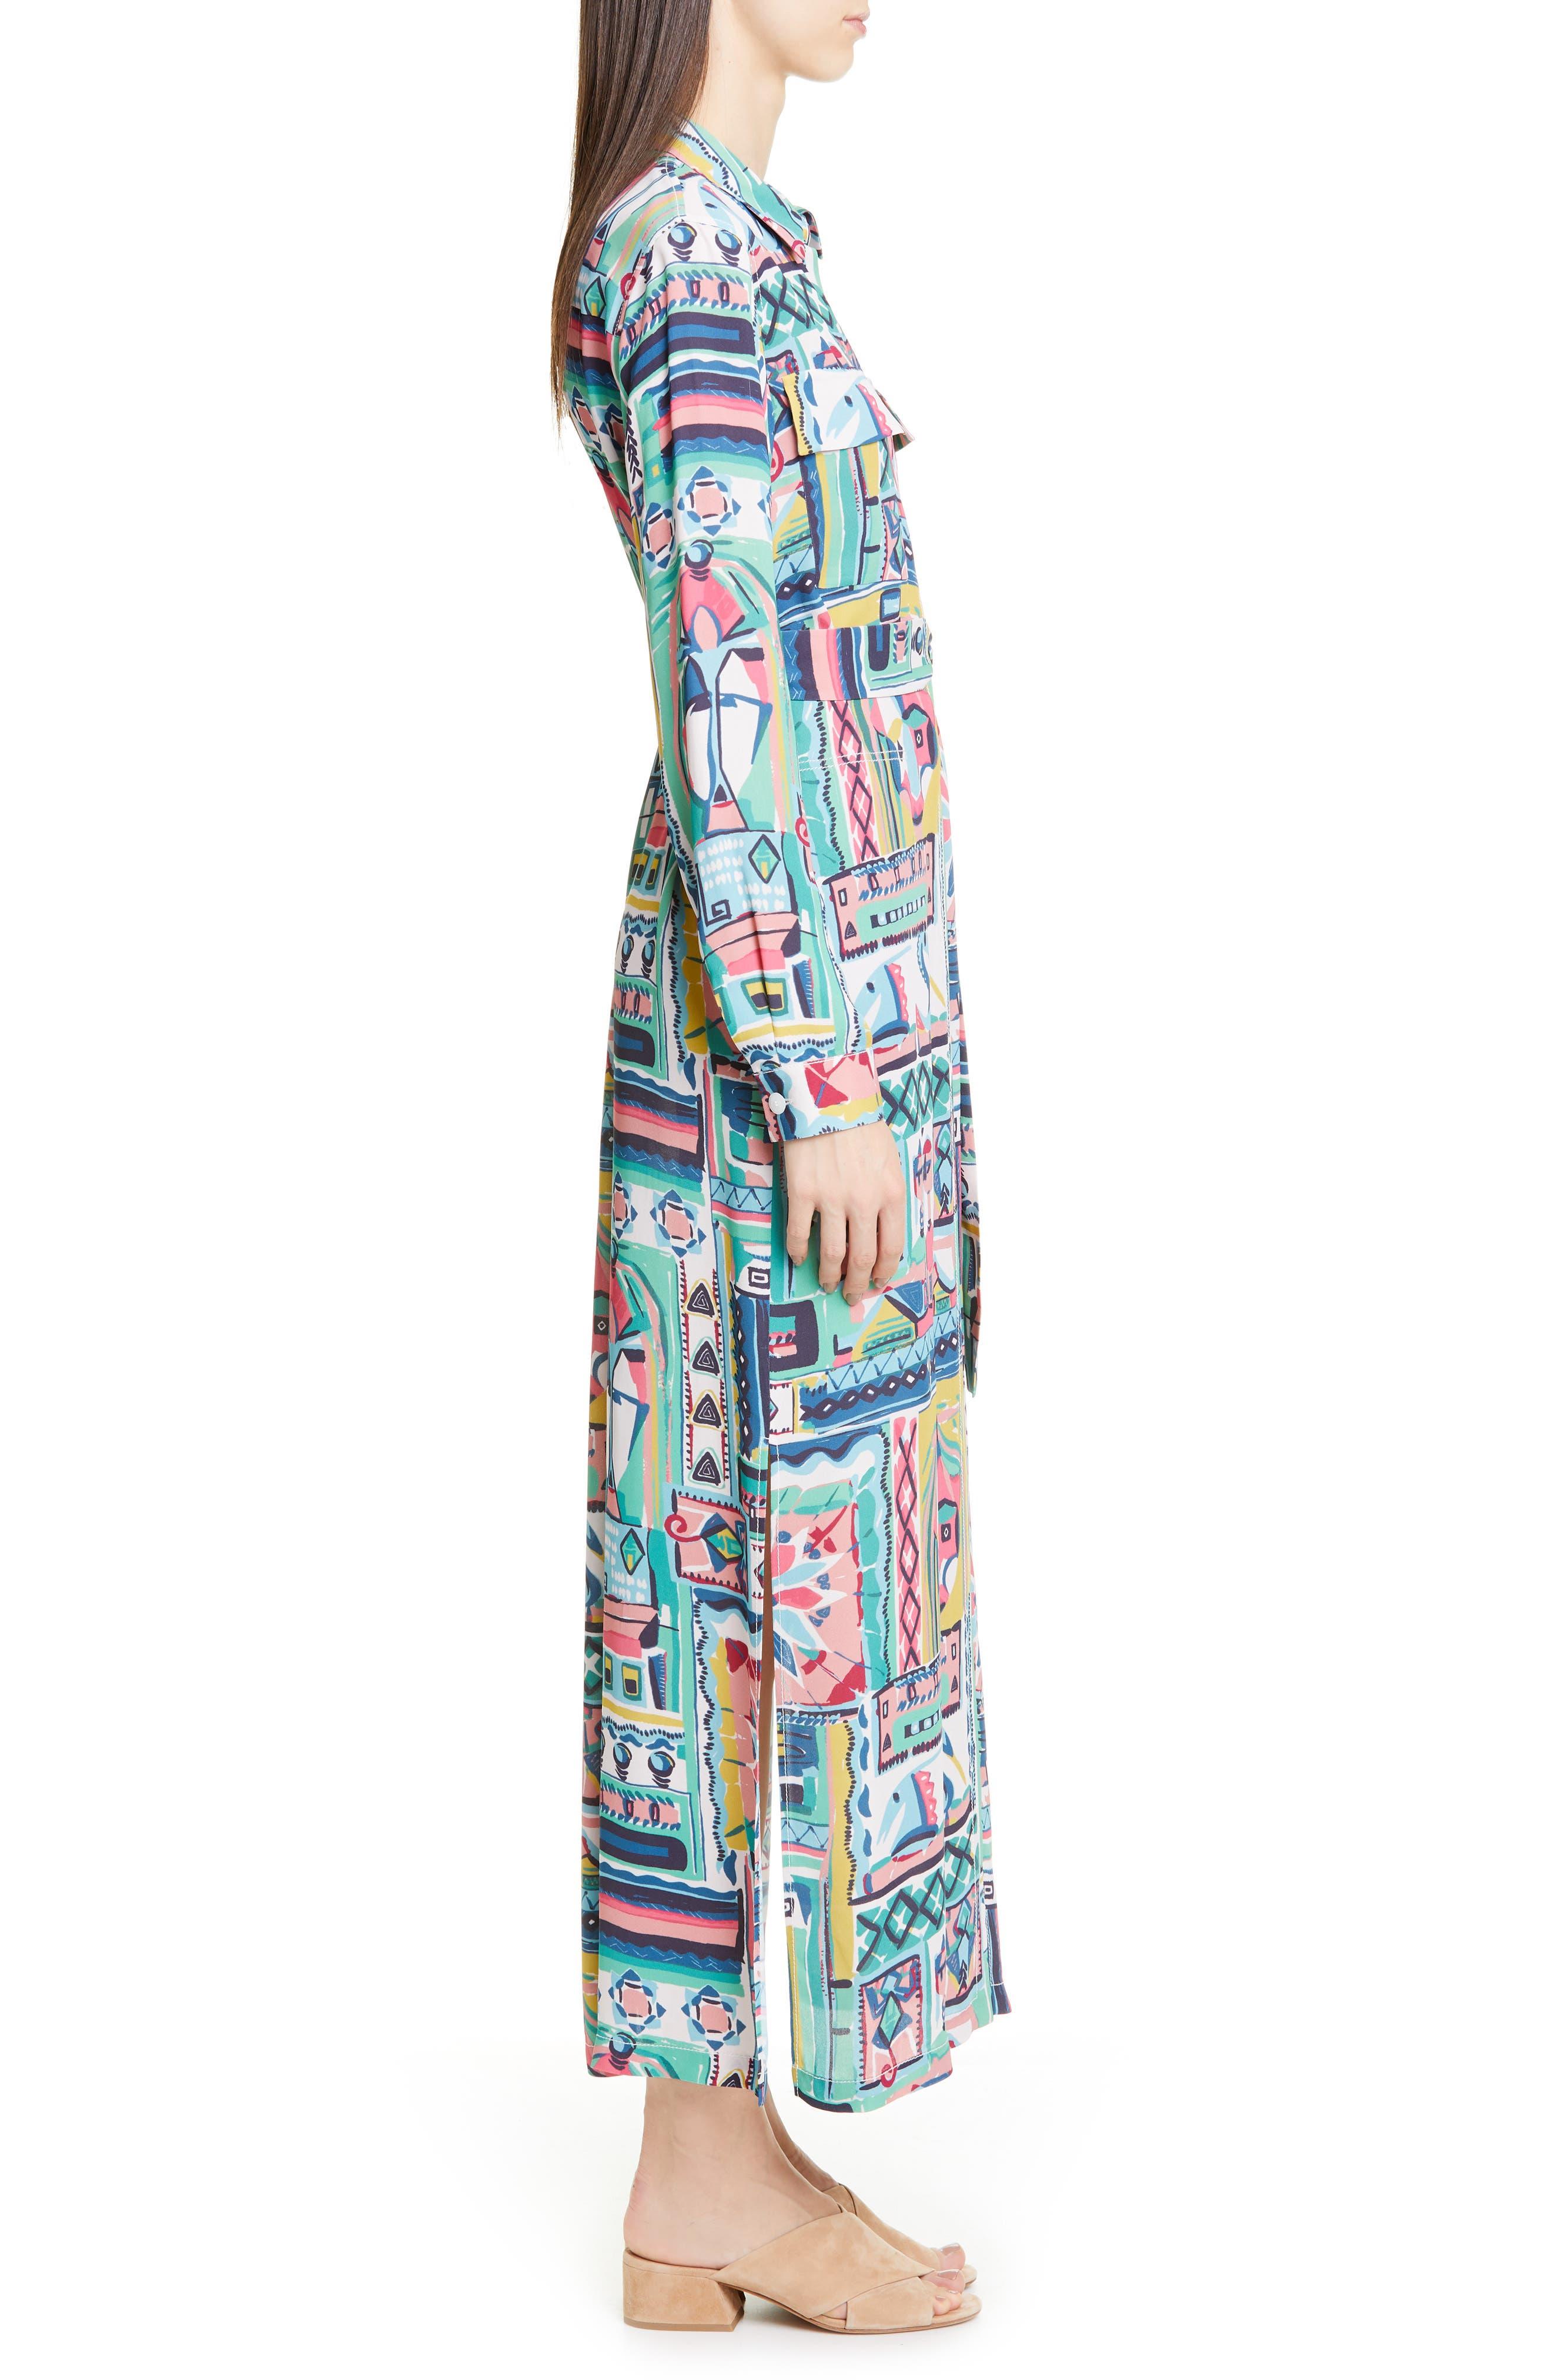 LAFAYETTE 148 NEW YORK, Doha Palazzo Patchwork Print Maxi Shirtdress, Alternate thumbnail 3, color, 400